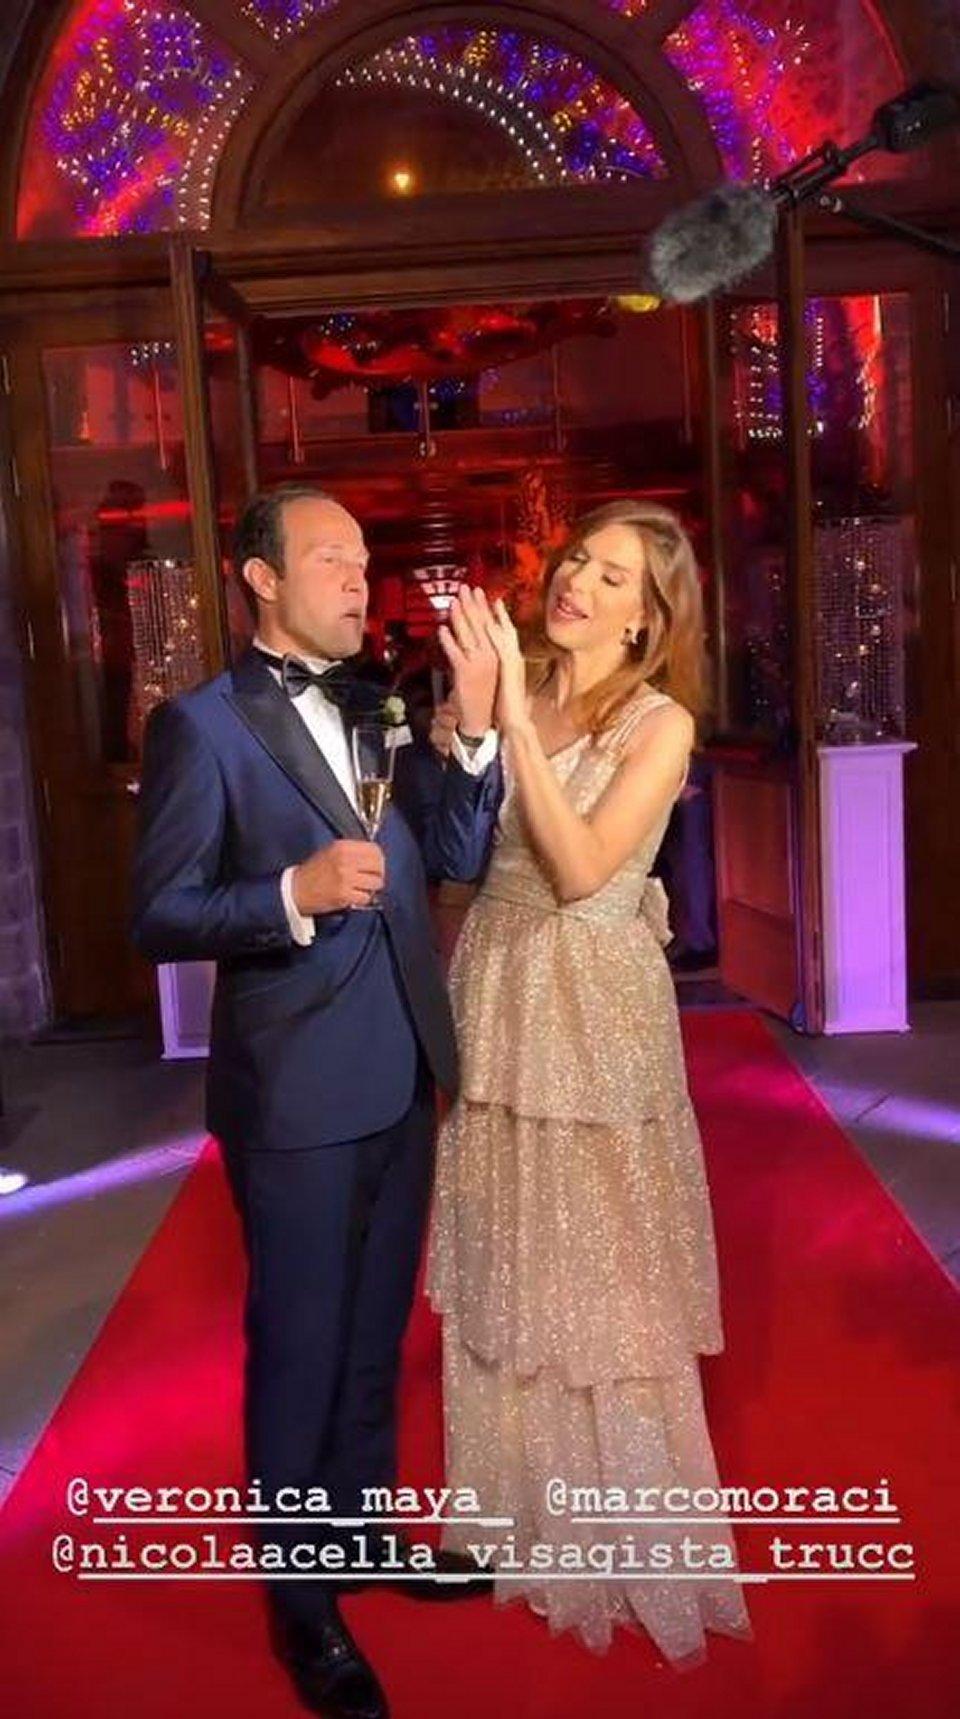 Veronica Maya sposa per la terza volta Marco Moraci